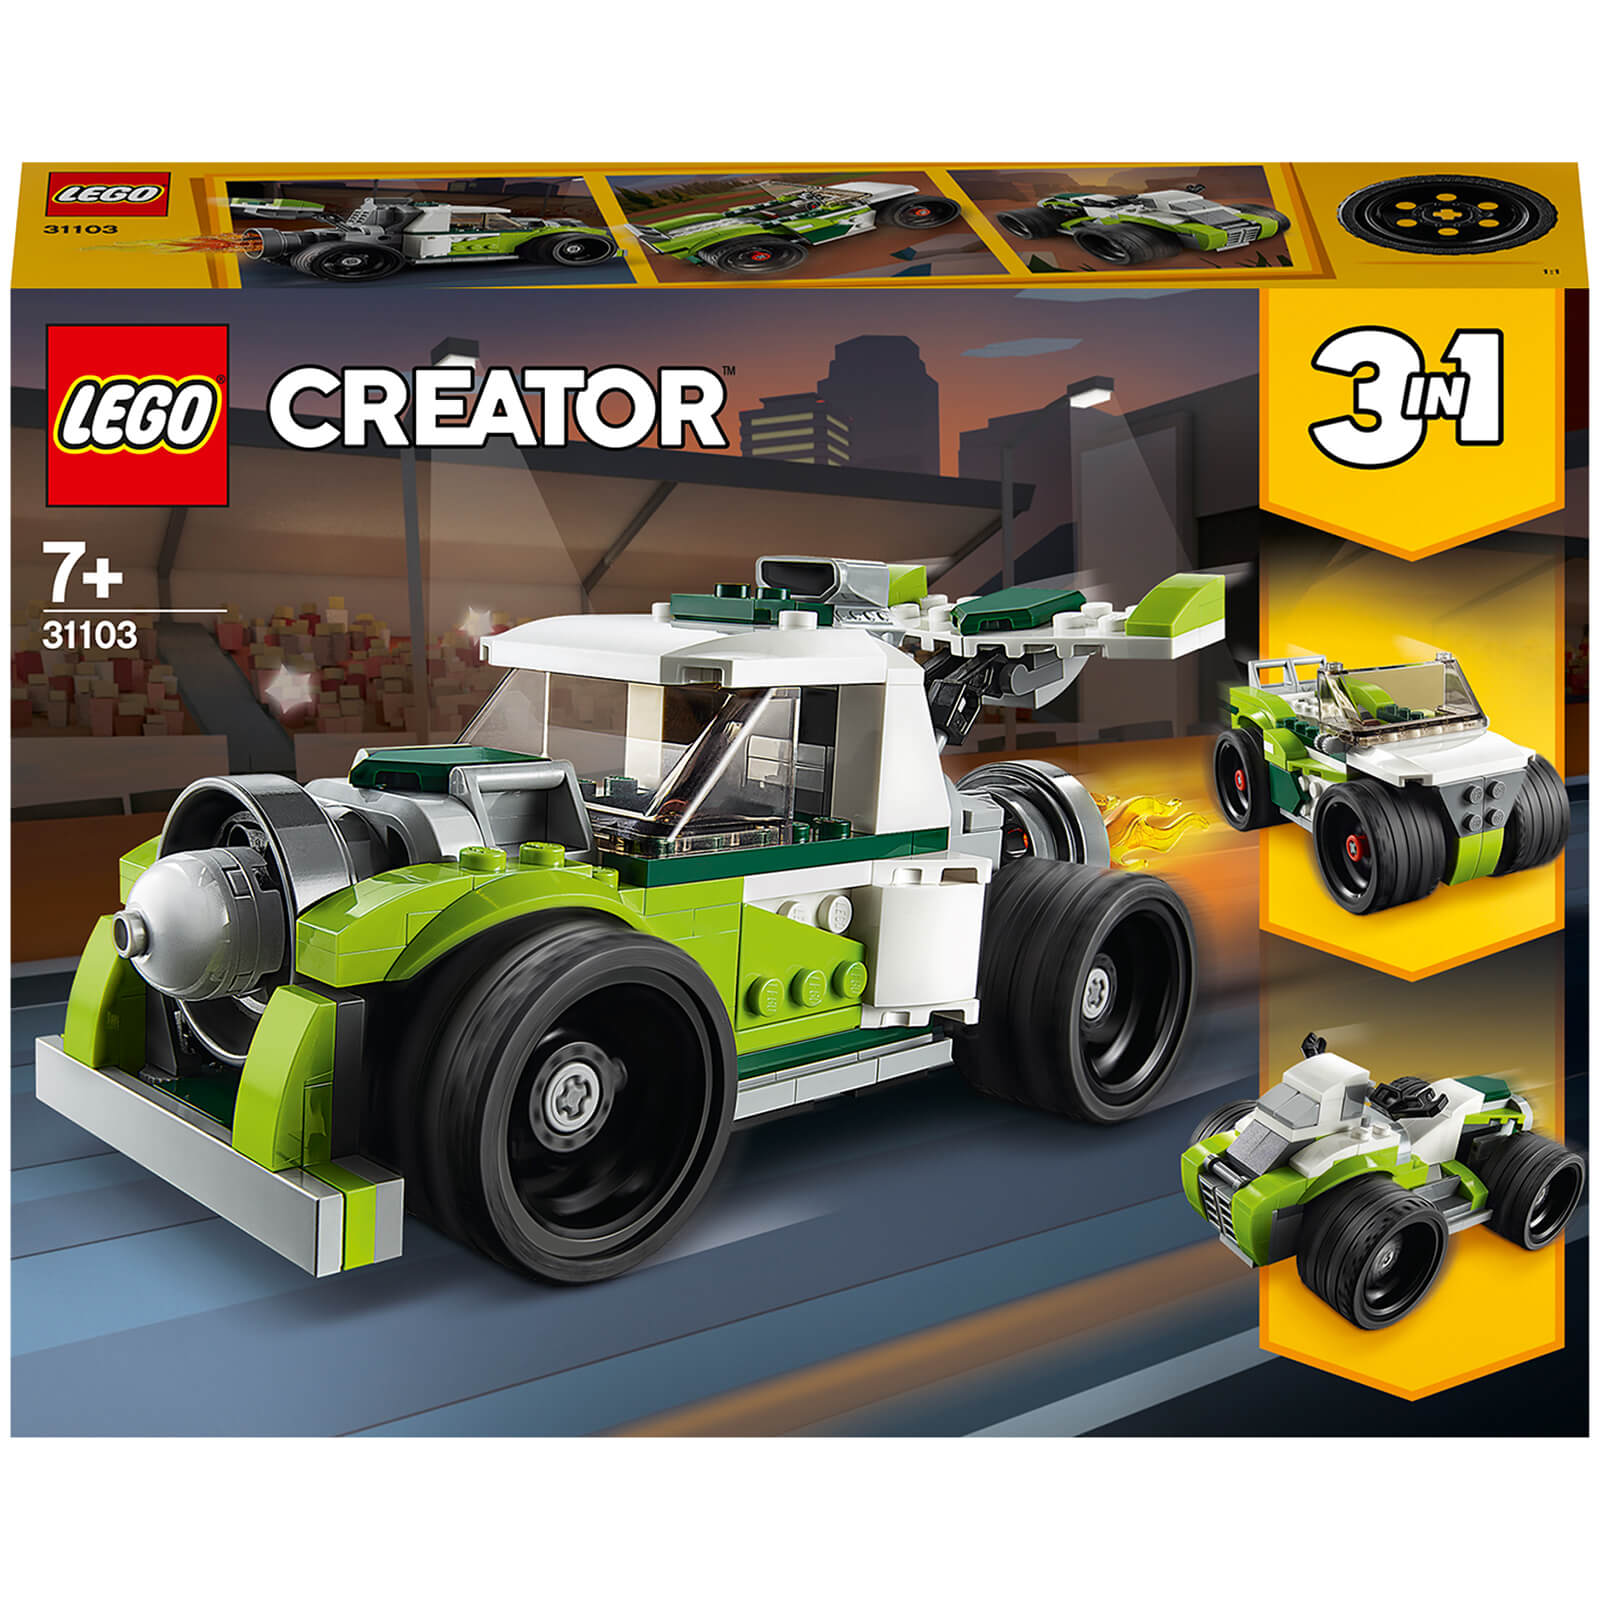 Image of LEGO Creator Rocket Truck - 31103